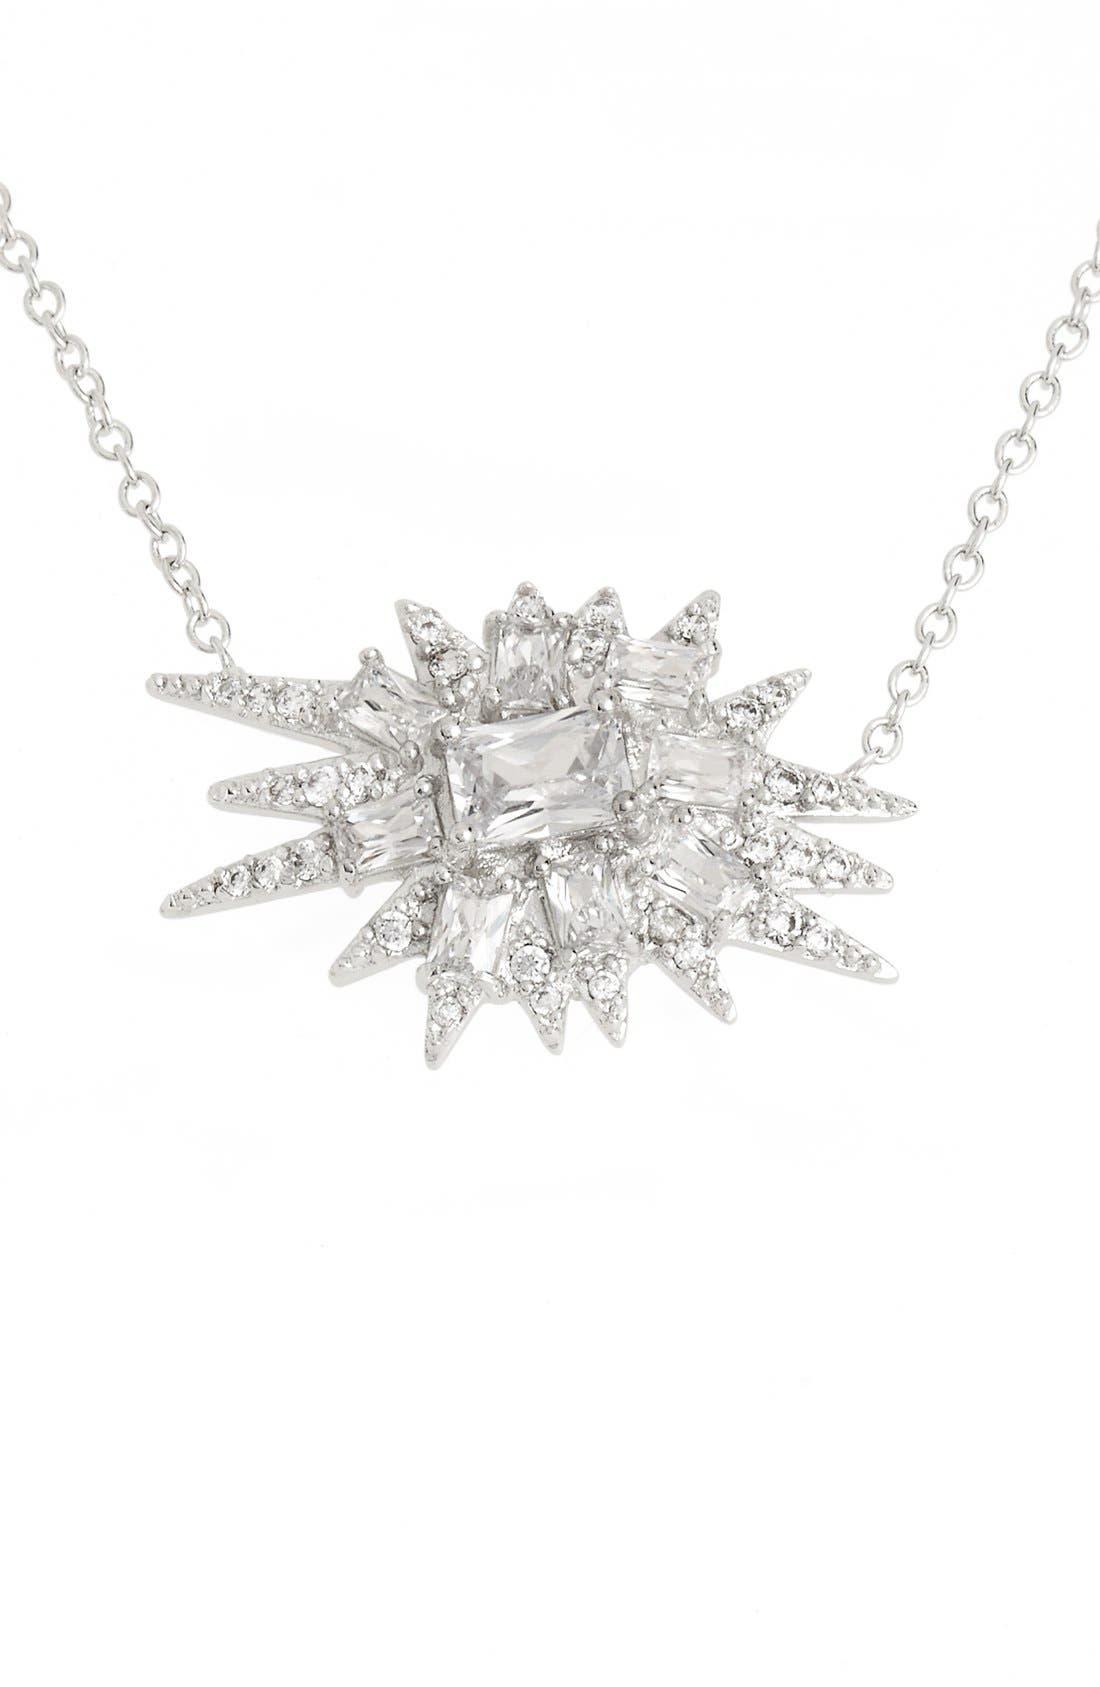 'Explosion' Cubic Zirconia Pendant Necklace,                             Main thumbnail 1, color,                             Silver